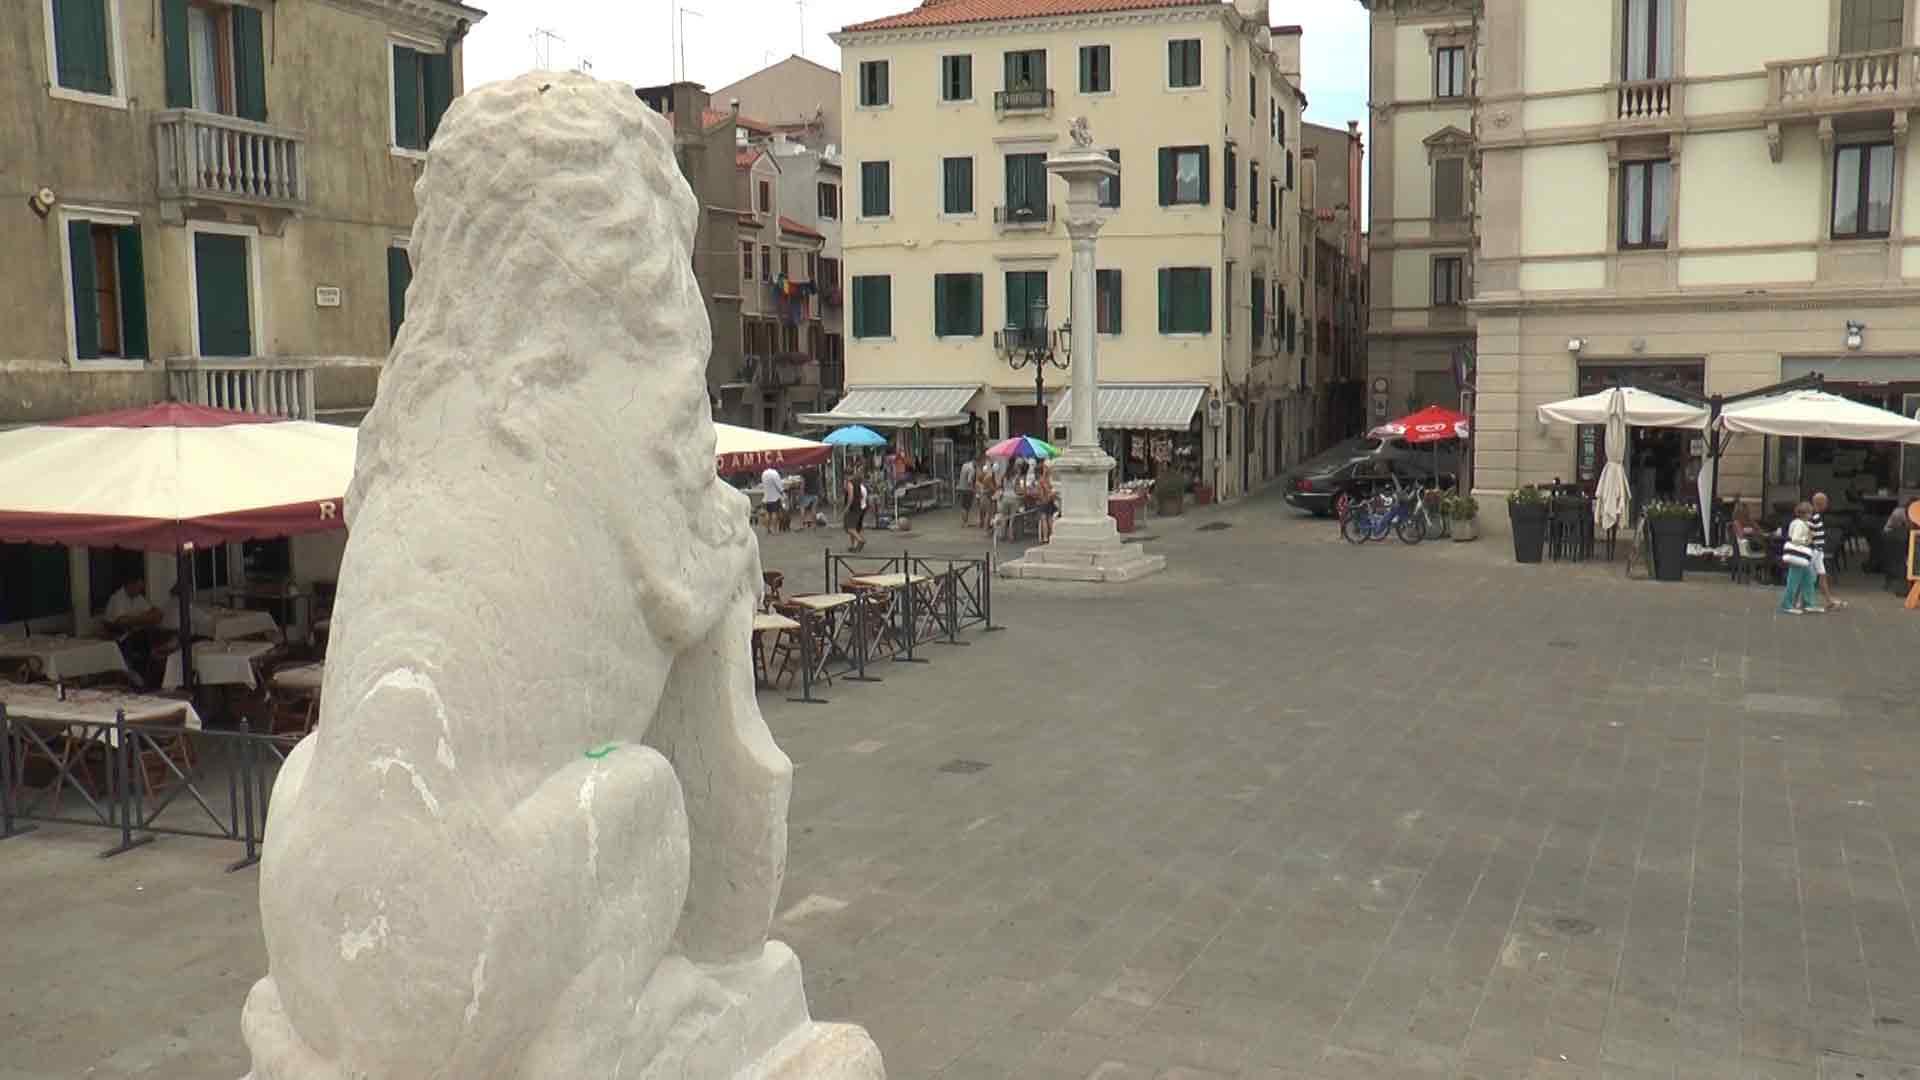 Chioggia - Piazzetta Vigo, el gato de ciosa